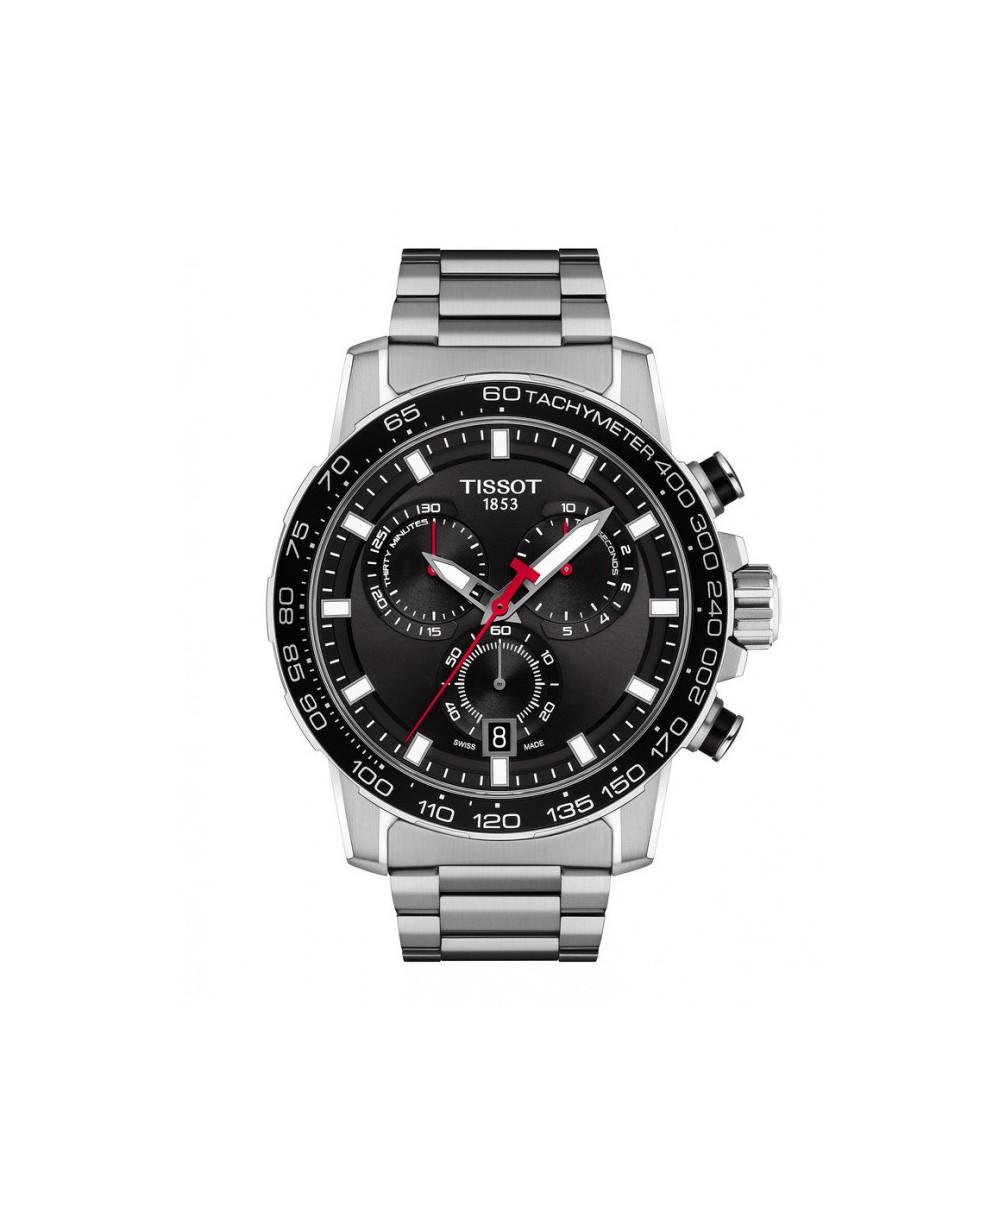 Reloj Tissot Supersport Chrono T125.617.11.051.00